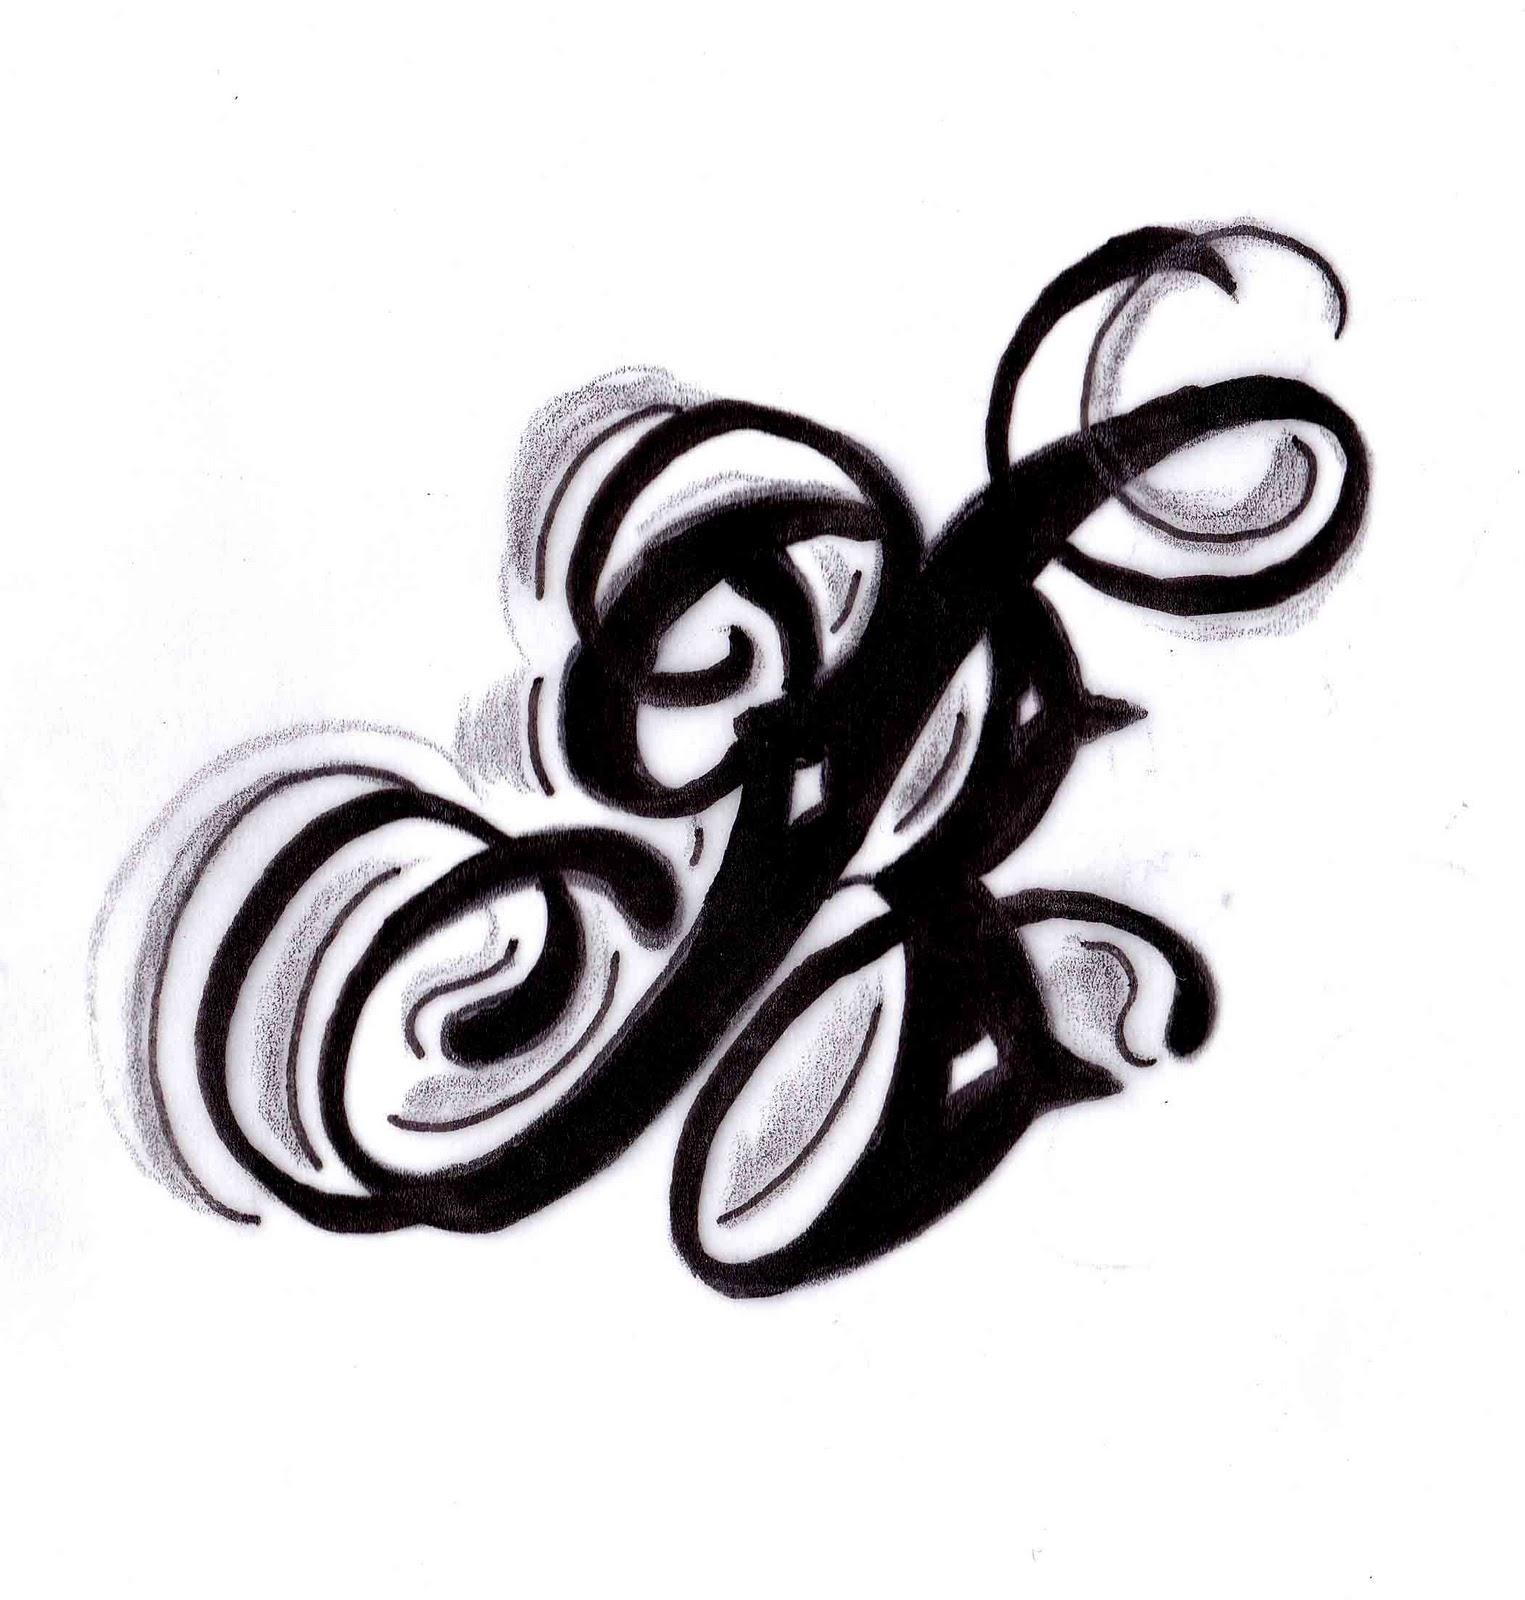 B Tattoo Images: Russell Butler: B Tattoo Design